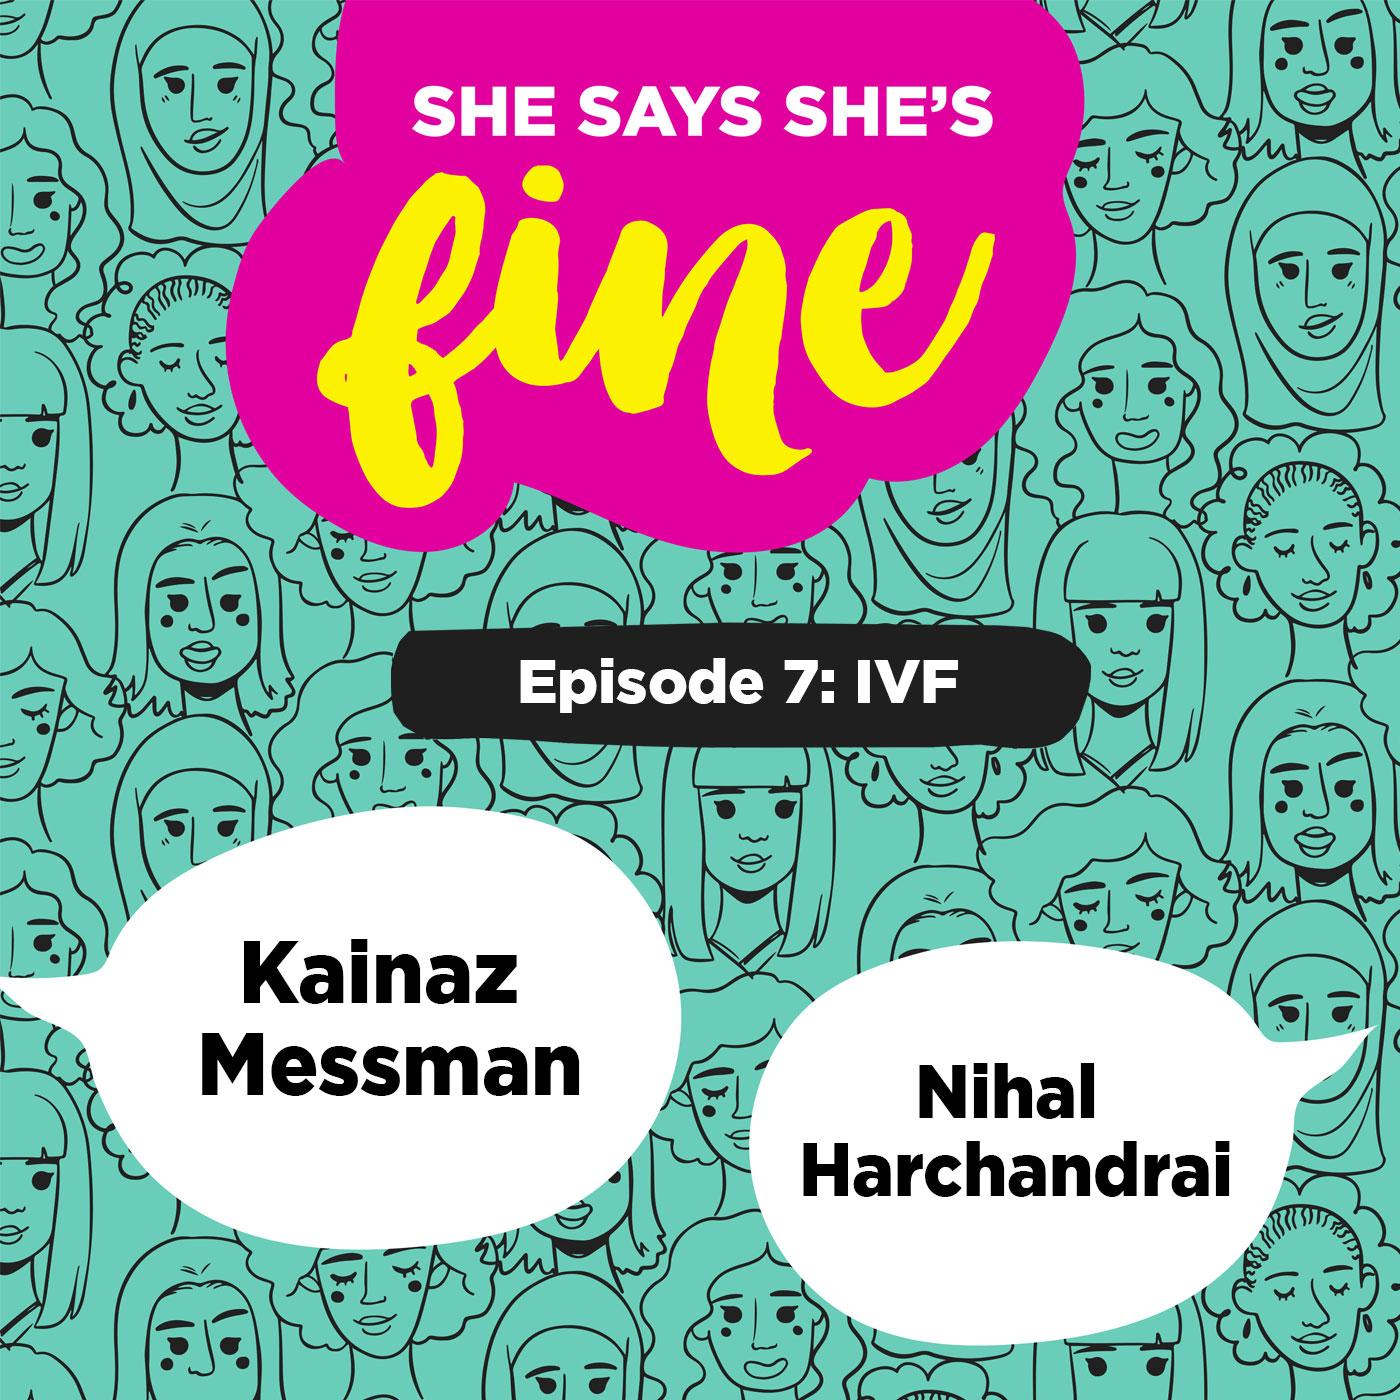 IVF ft. Kainaz Messman & Nihal Harchandrai